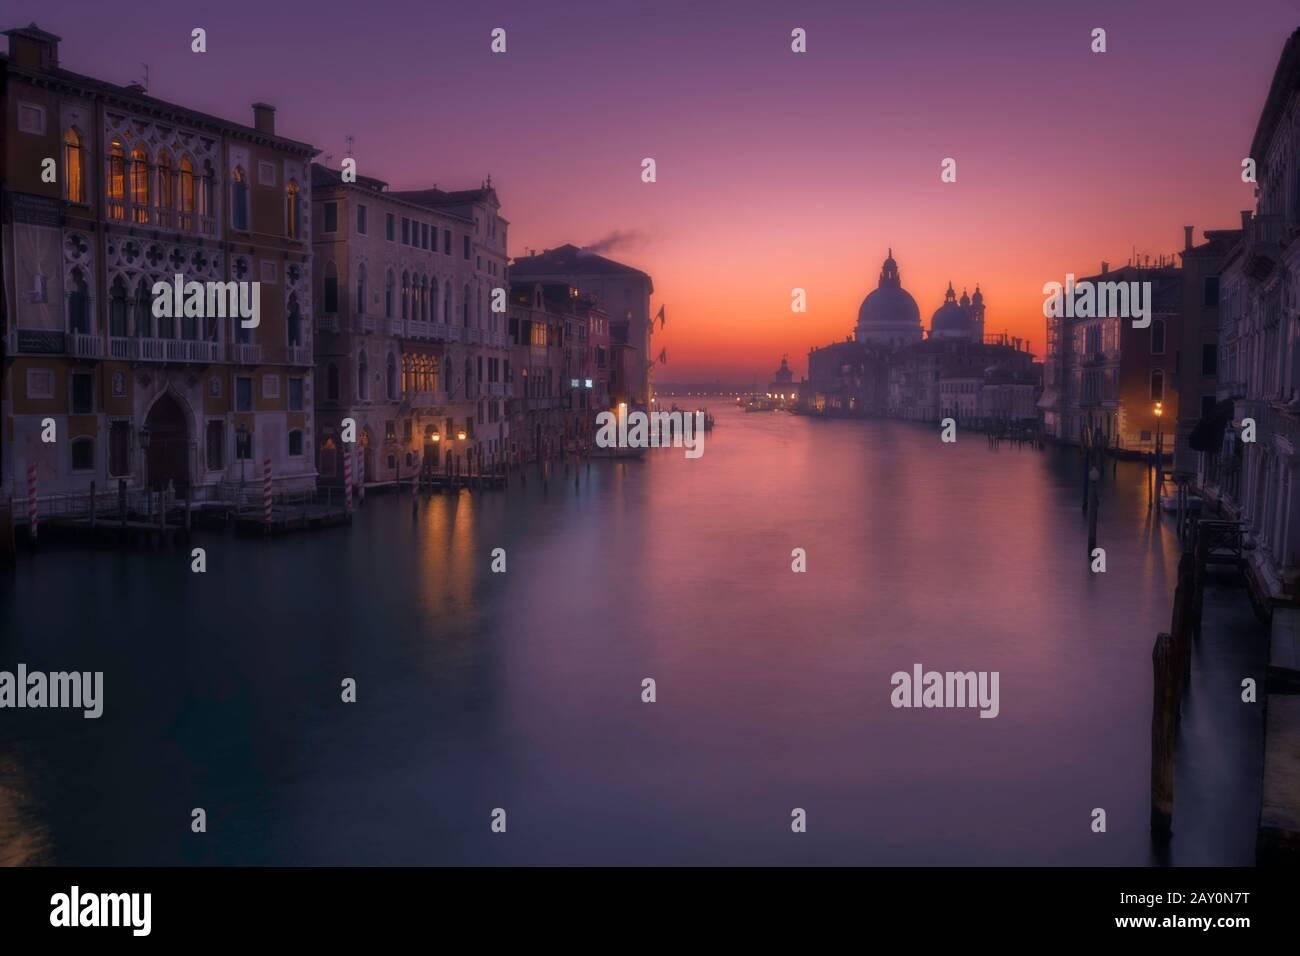 Stadtbild mit Canal Grande und Kirche Santa Maria della Salute, Venedig, Venetien, Italien Stockfoto